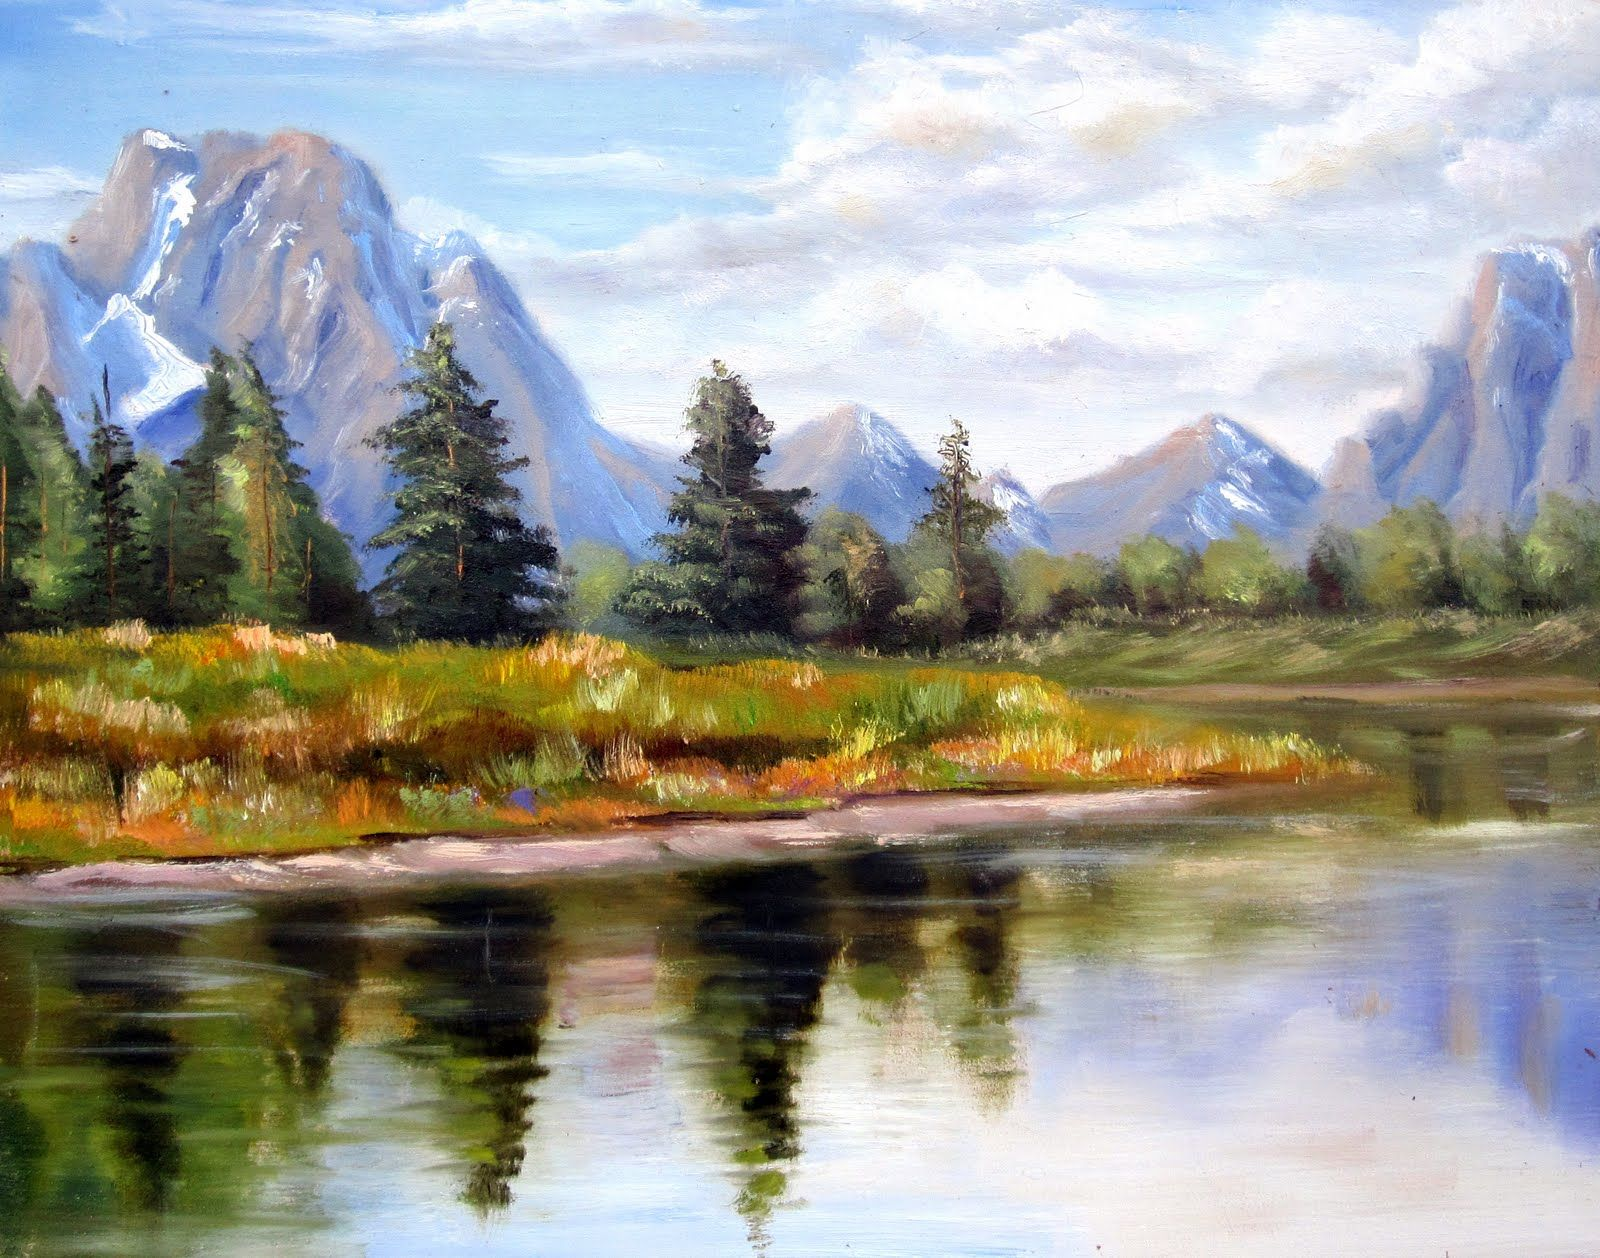 Landscape Art Paintings Gallery